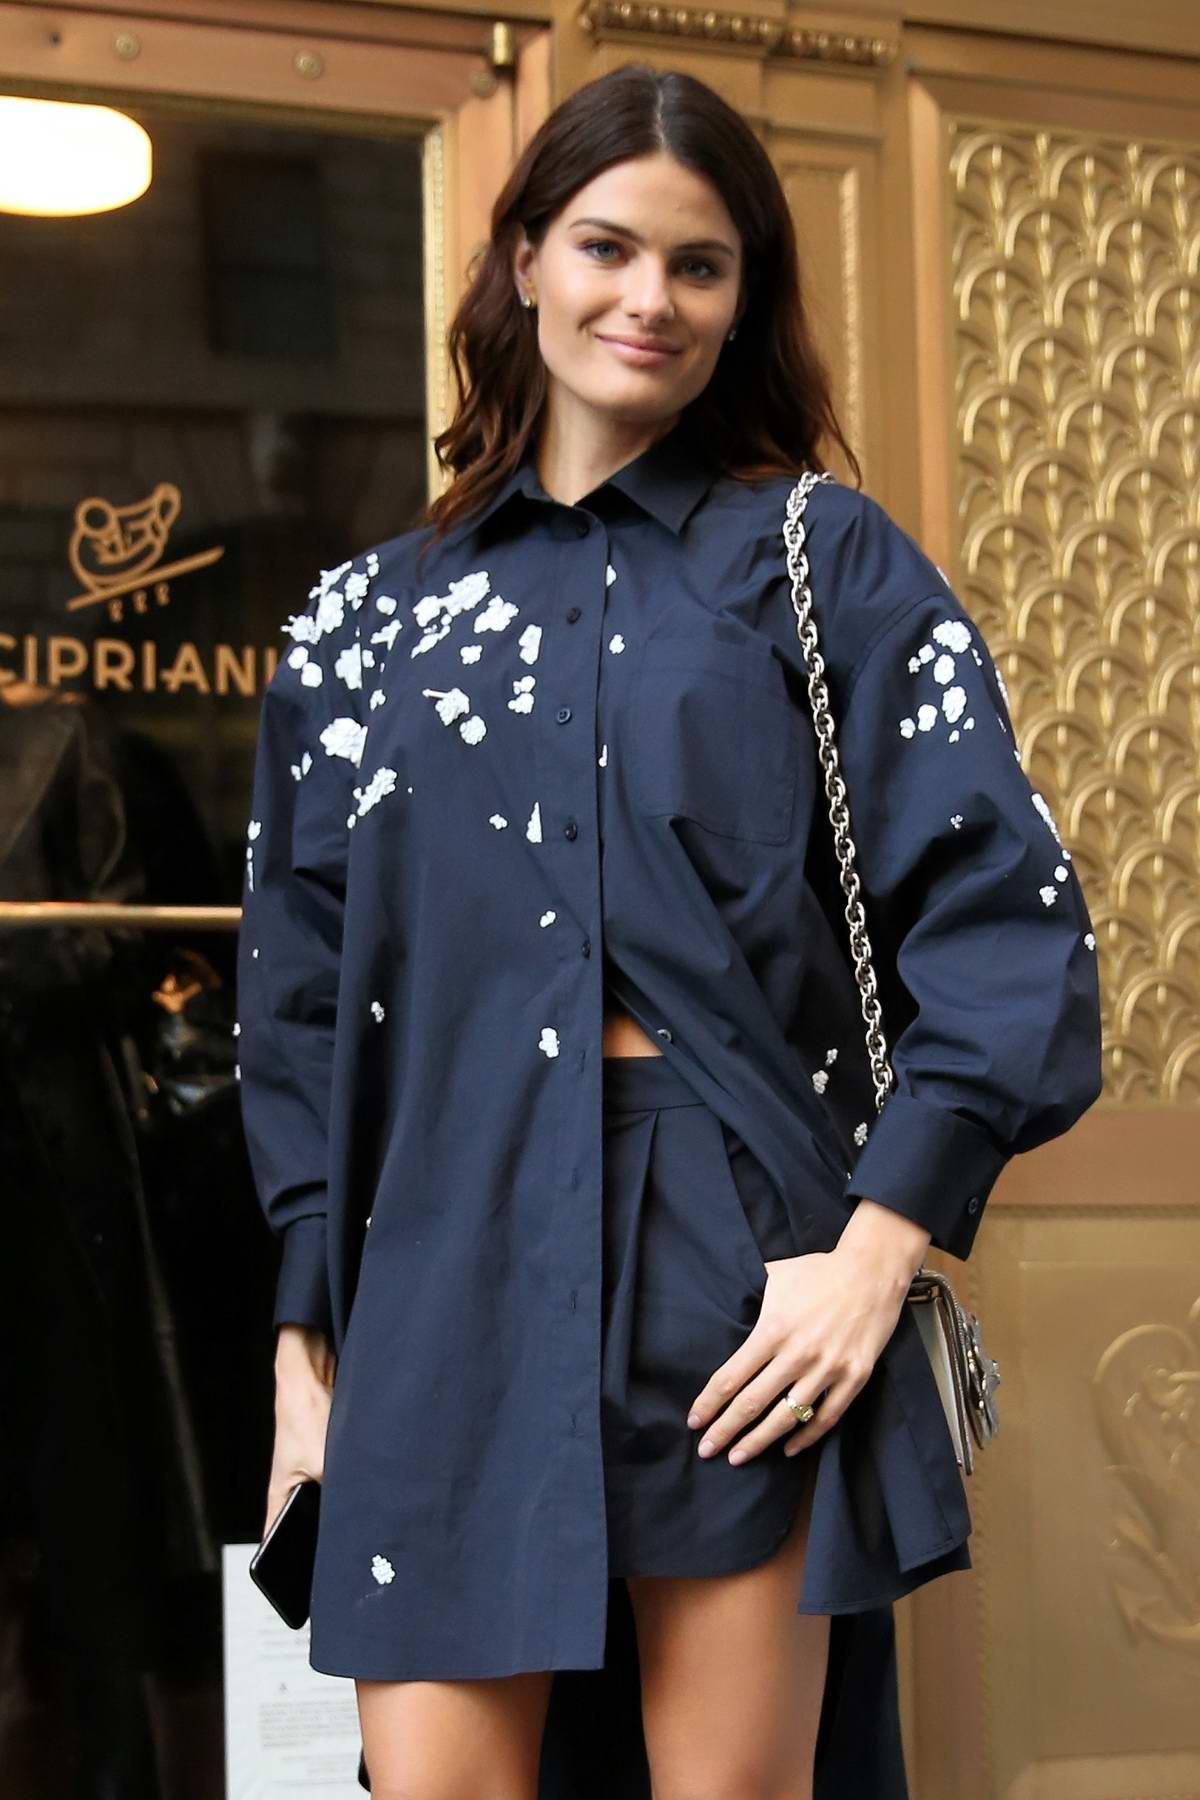 Isabeli Fontana attends Oscar de la Renta AW18 at Cunard Building during New York Fashion Week in New York City